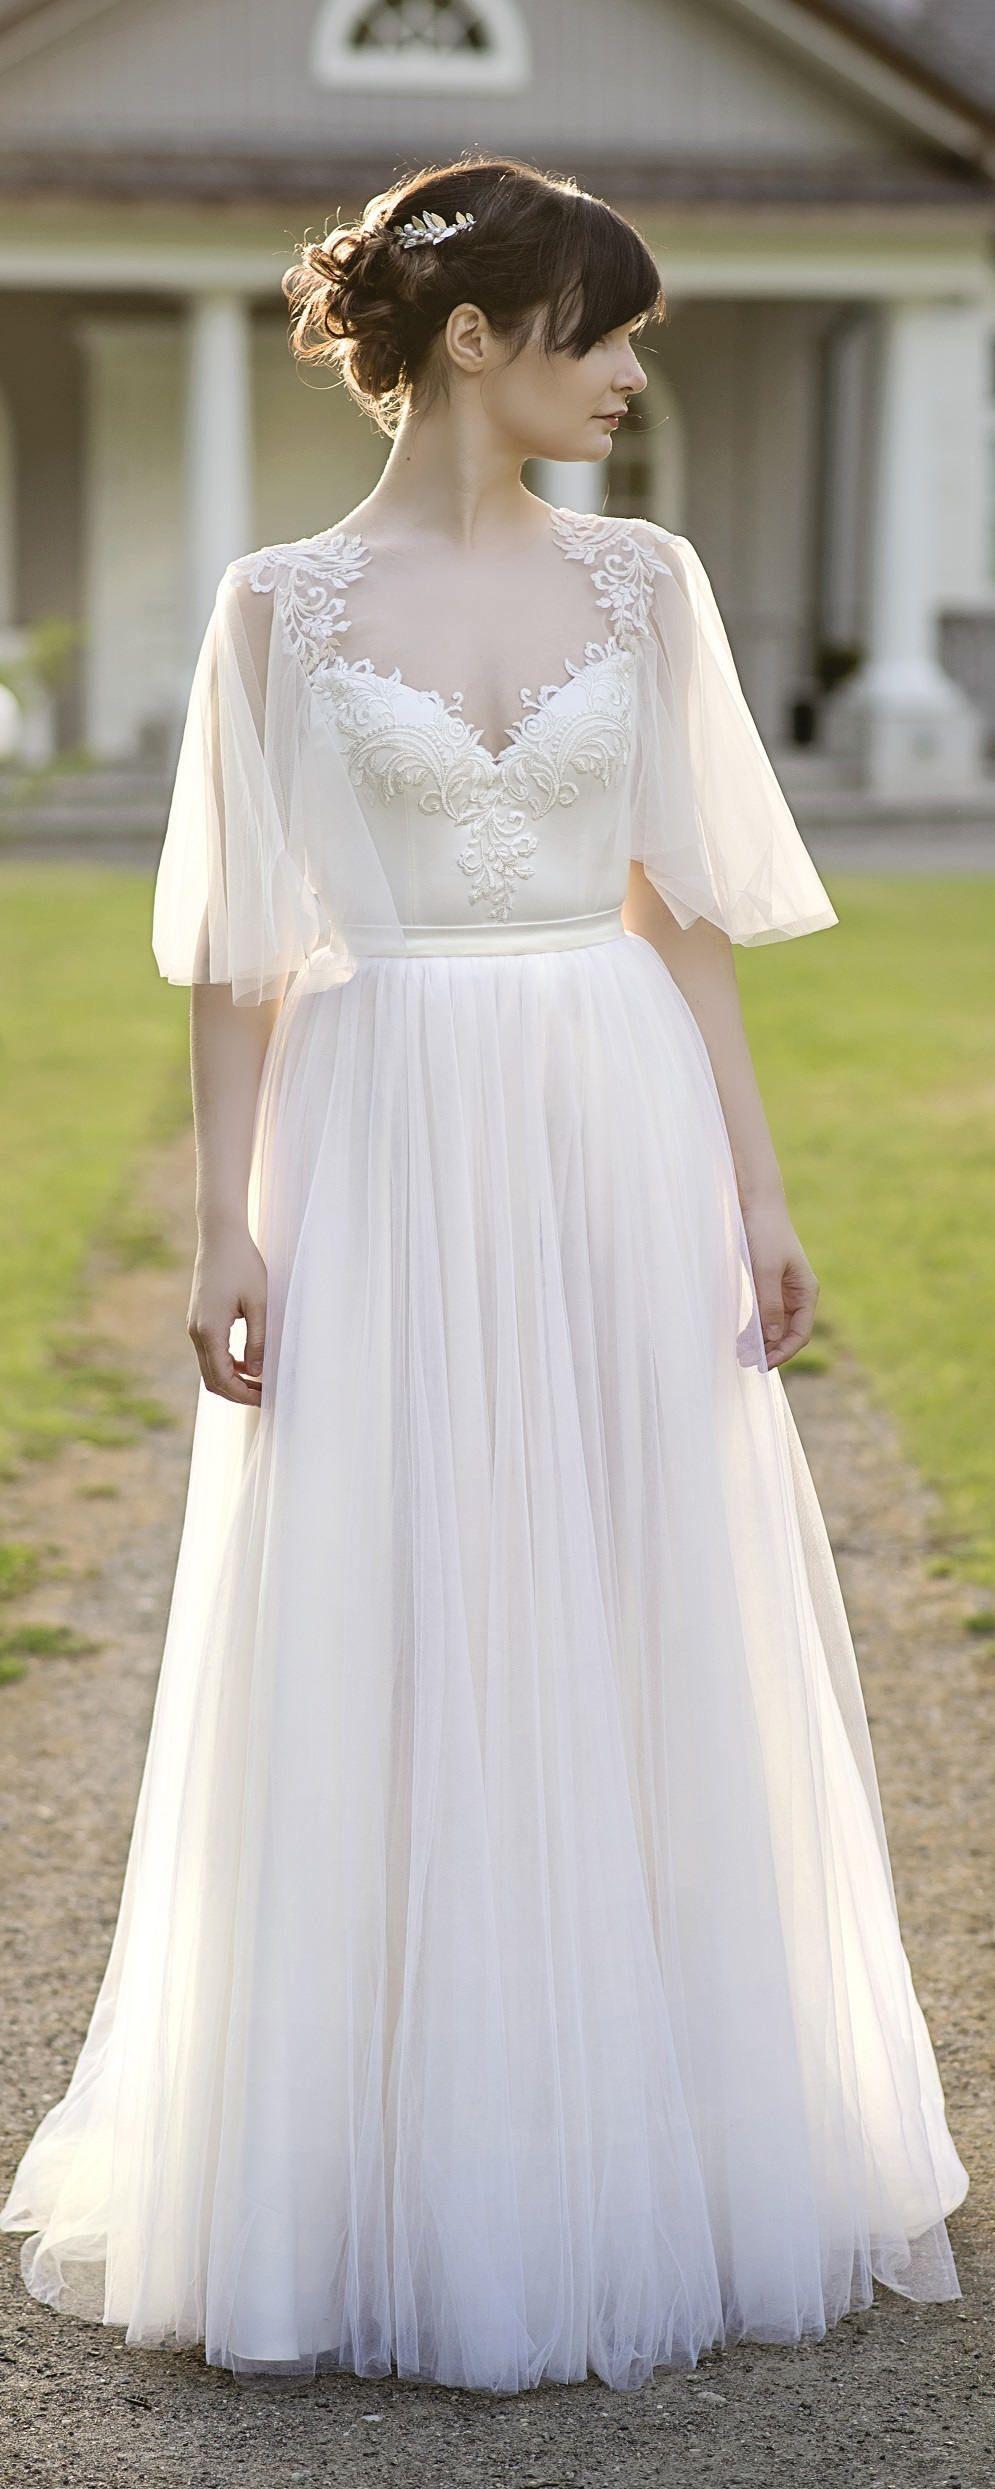 Grace bohemian wedding dress wedding dress open back wedding